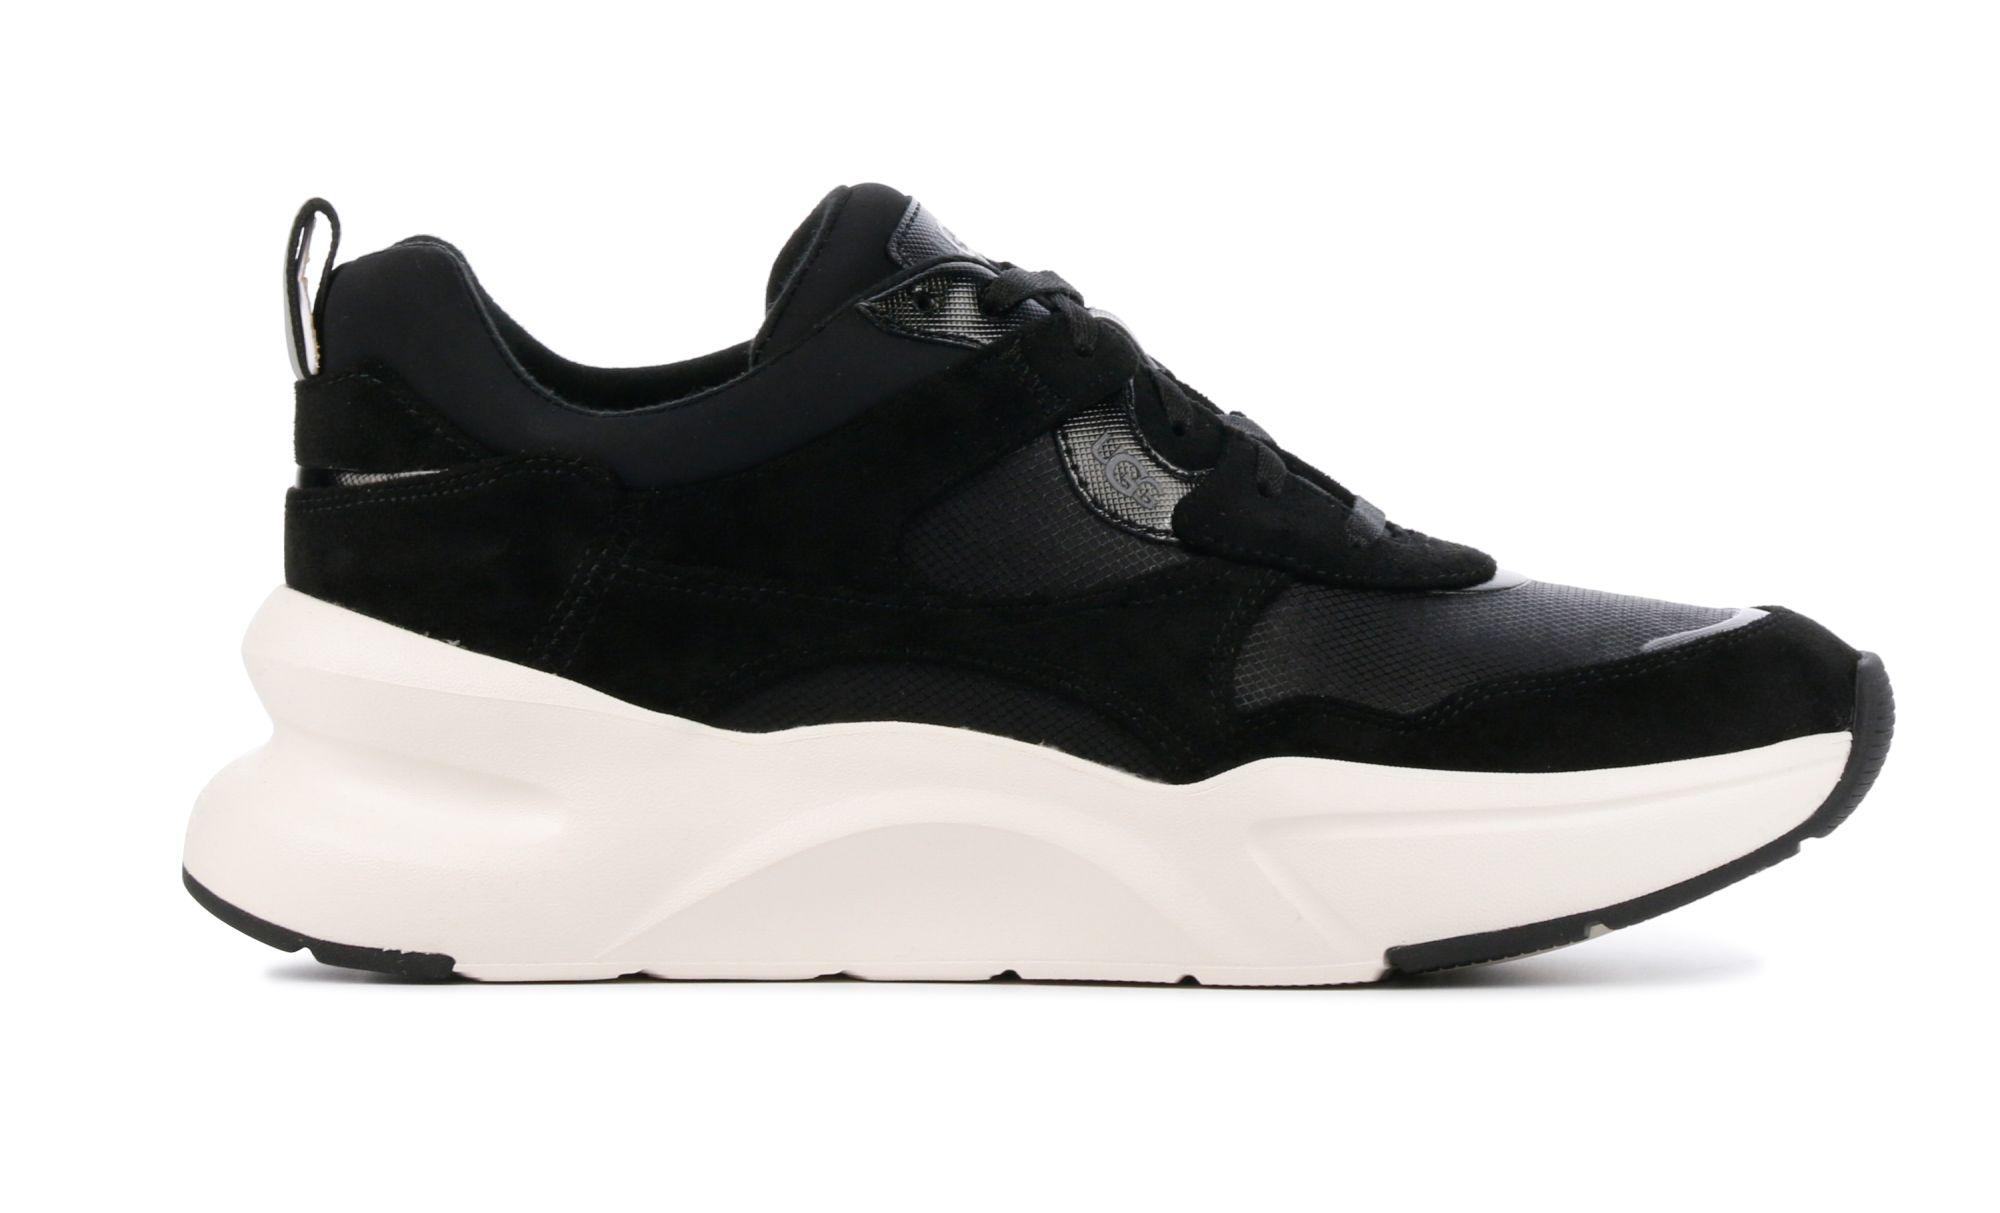 UGG Dames Leren SneakersSneakers